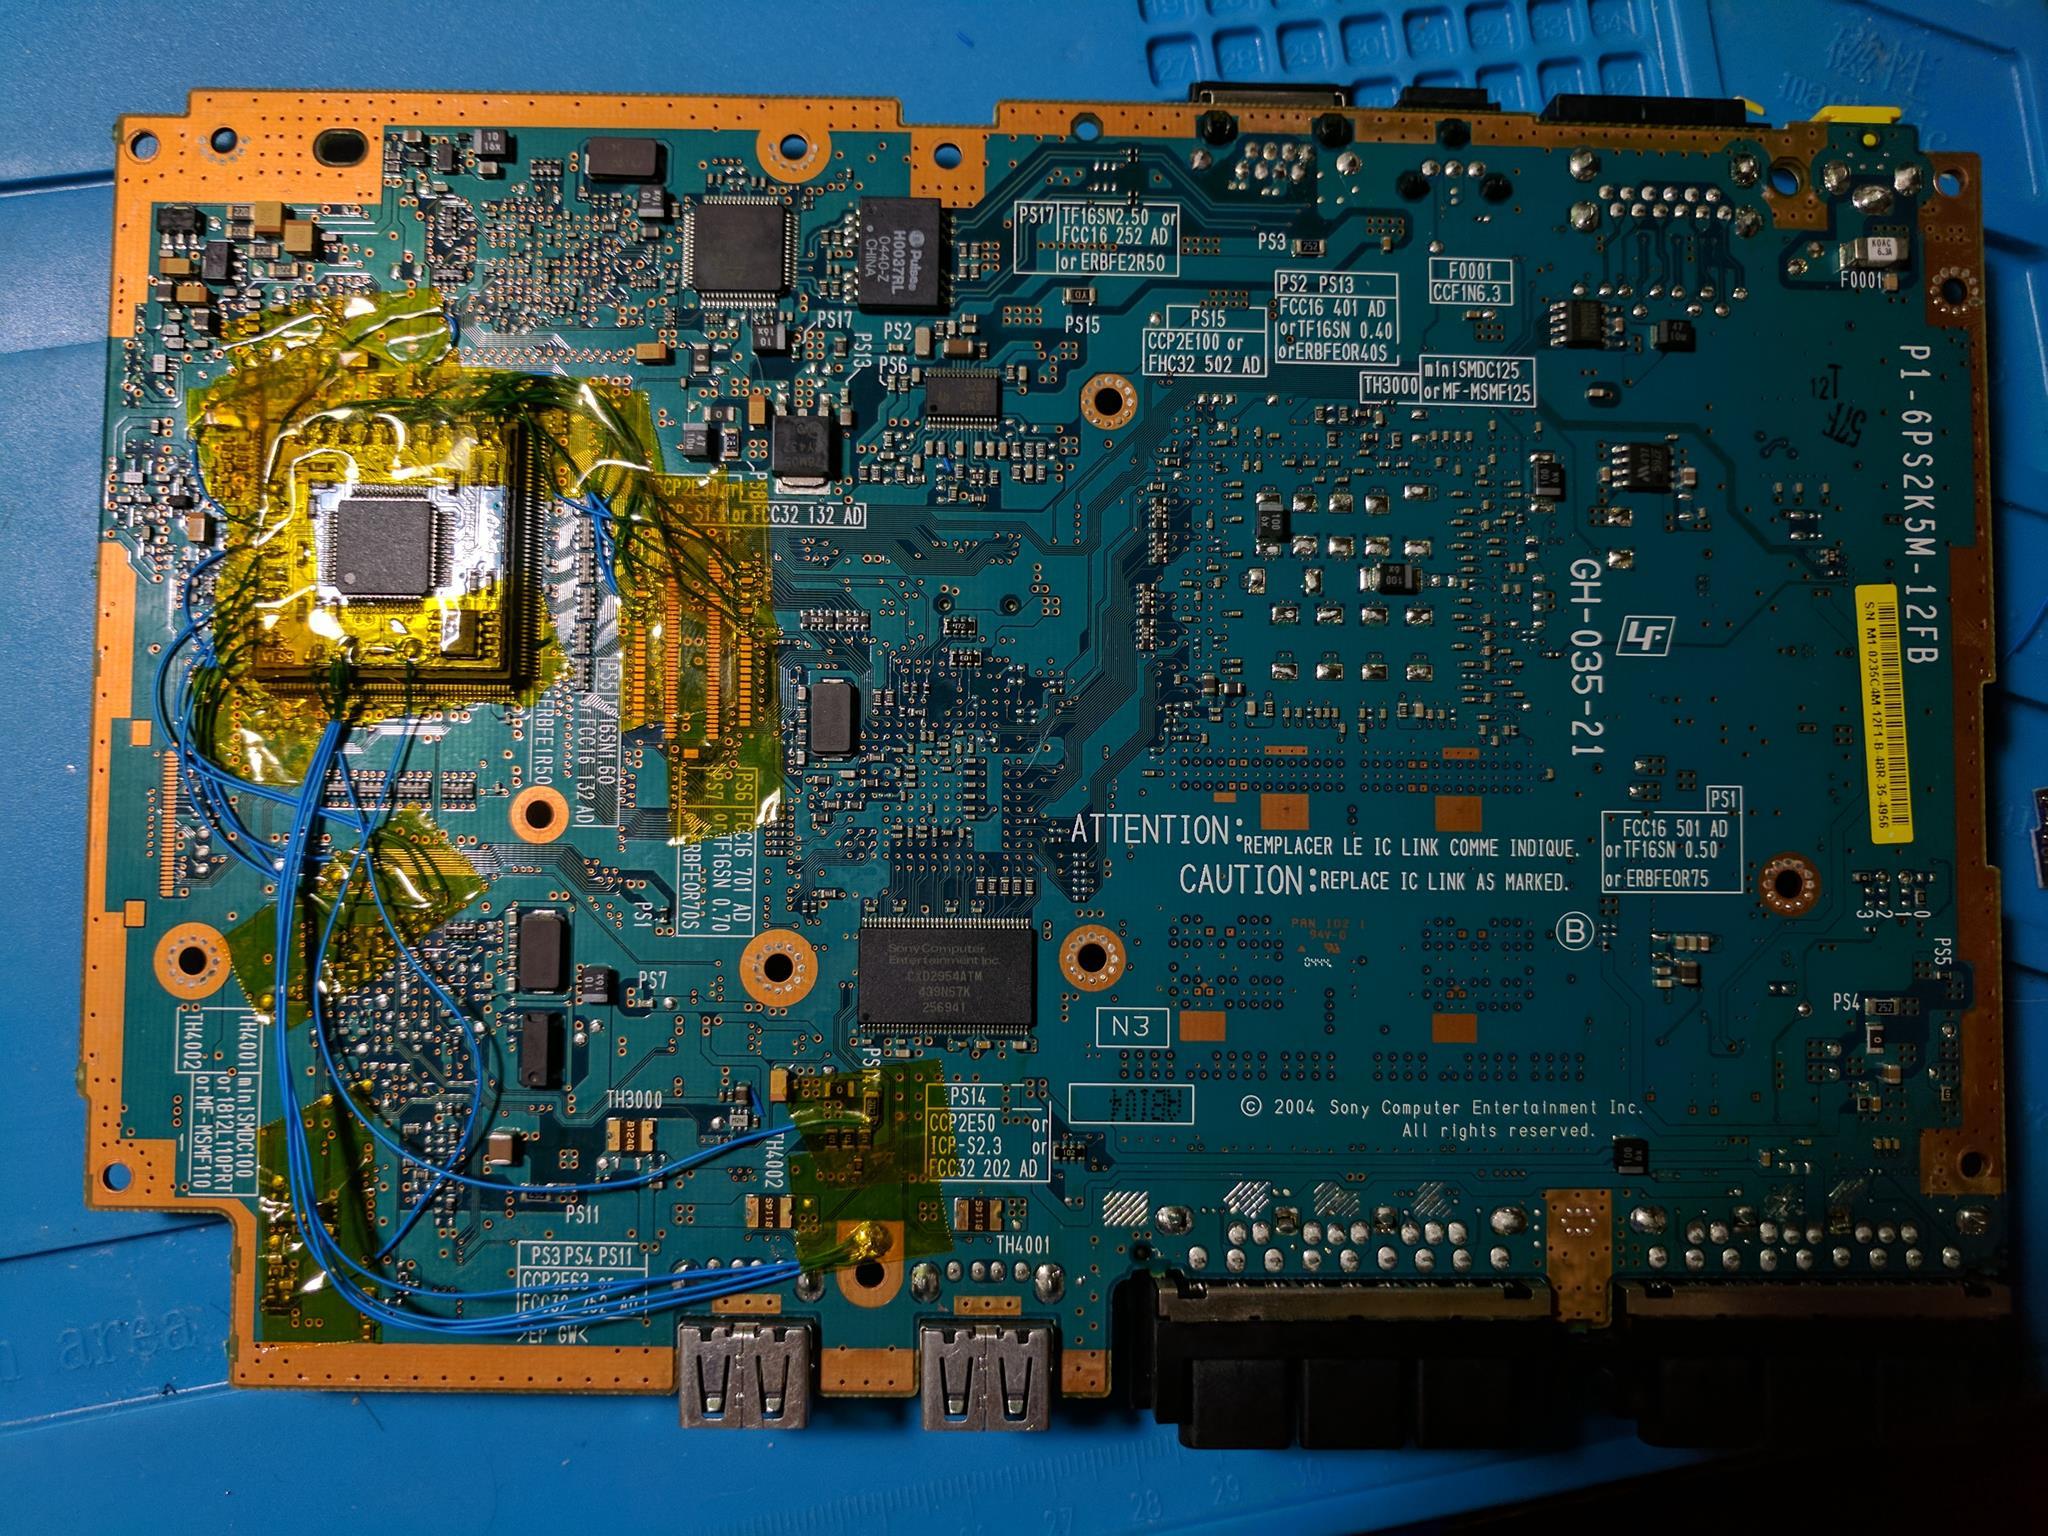 Scph 70012 Ps2 Modbo 40 Modchip Installation V12 Ntsc Board Playstation 2 Circuit Diagram